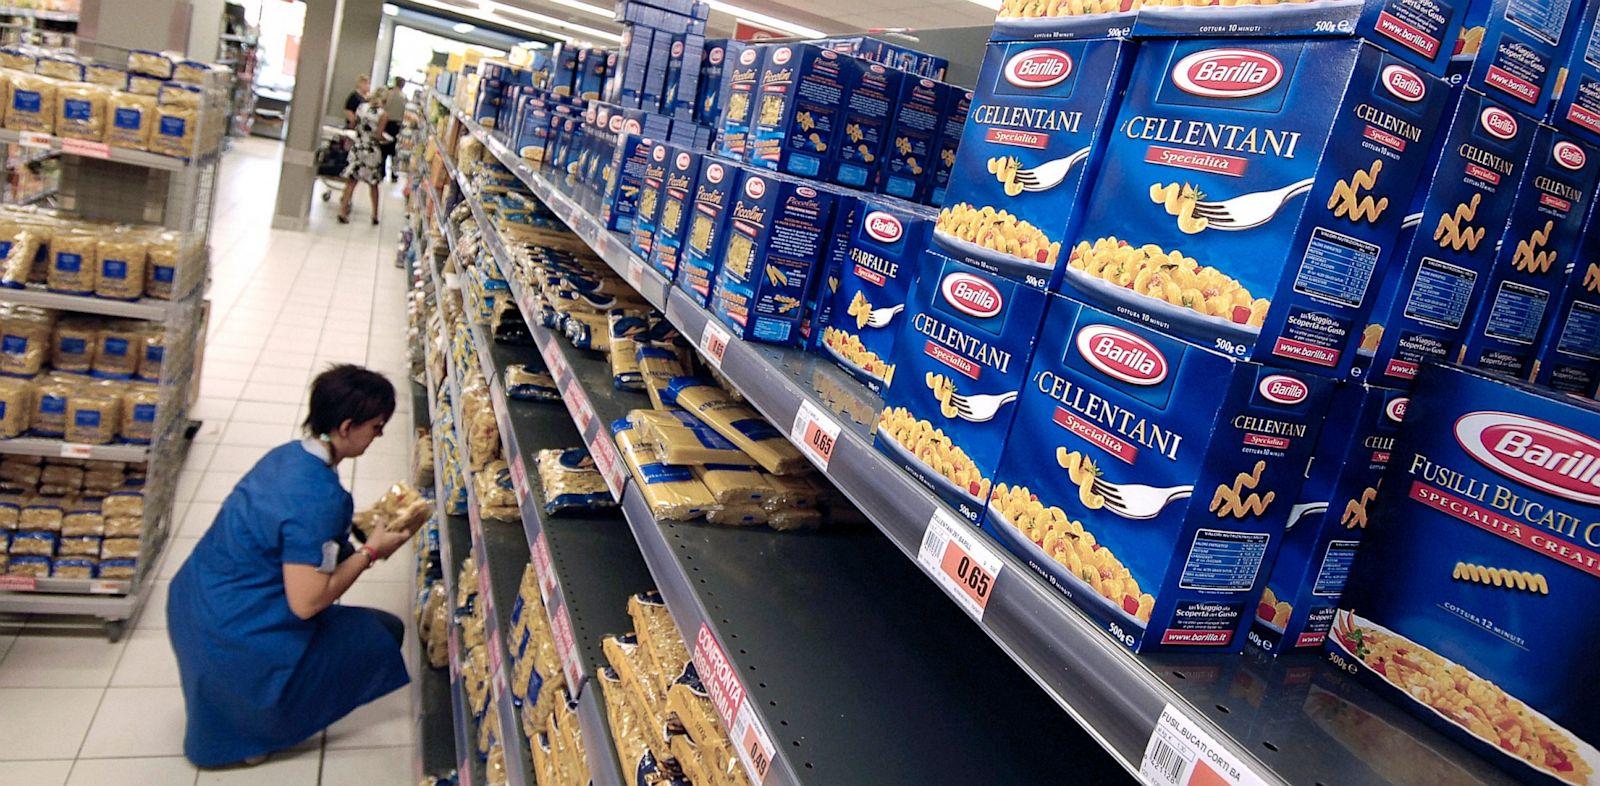 PHOTO: An employee stocks Barilla pasta on supermarket shelves near Milan, Italy, Sept. 13, 2007.